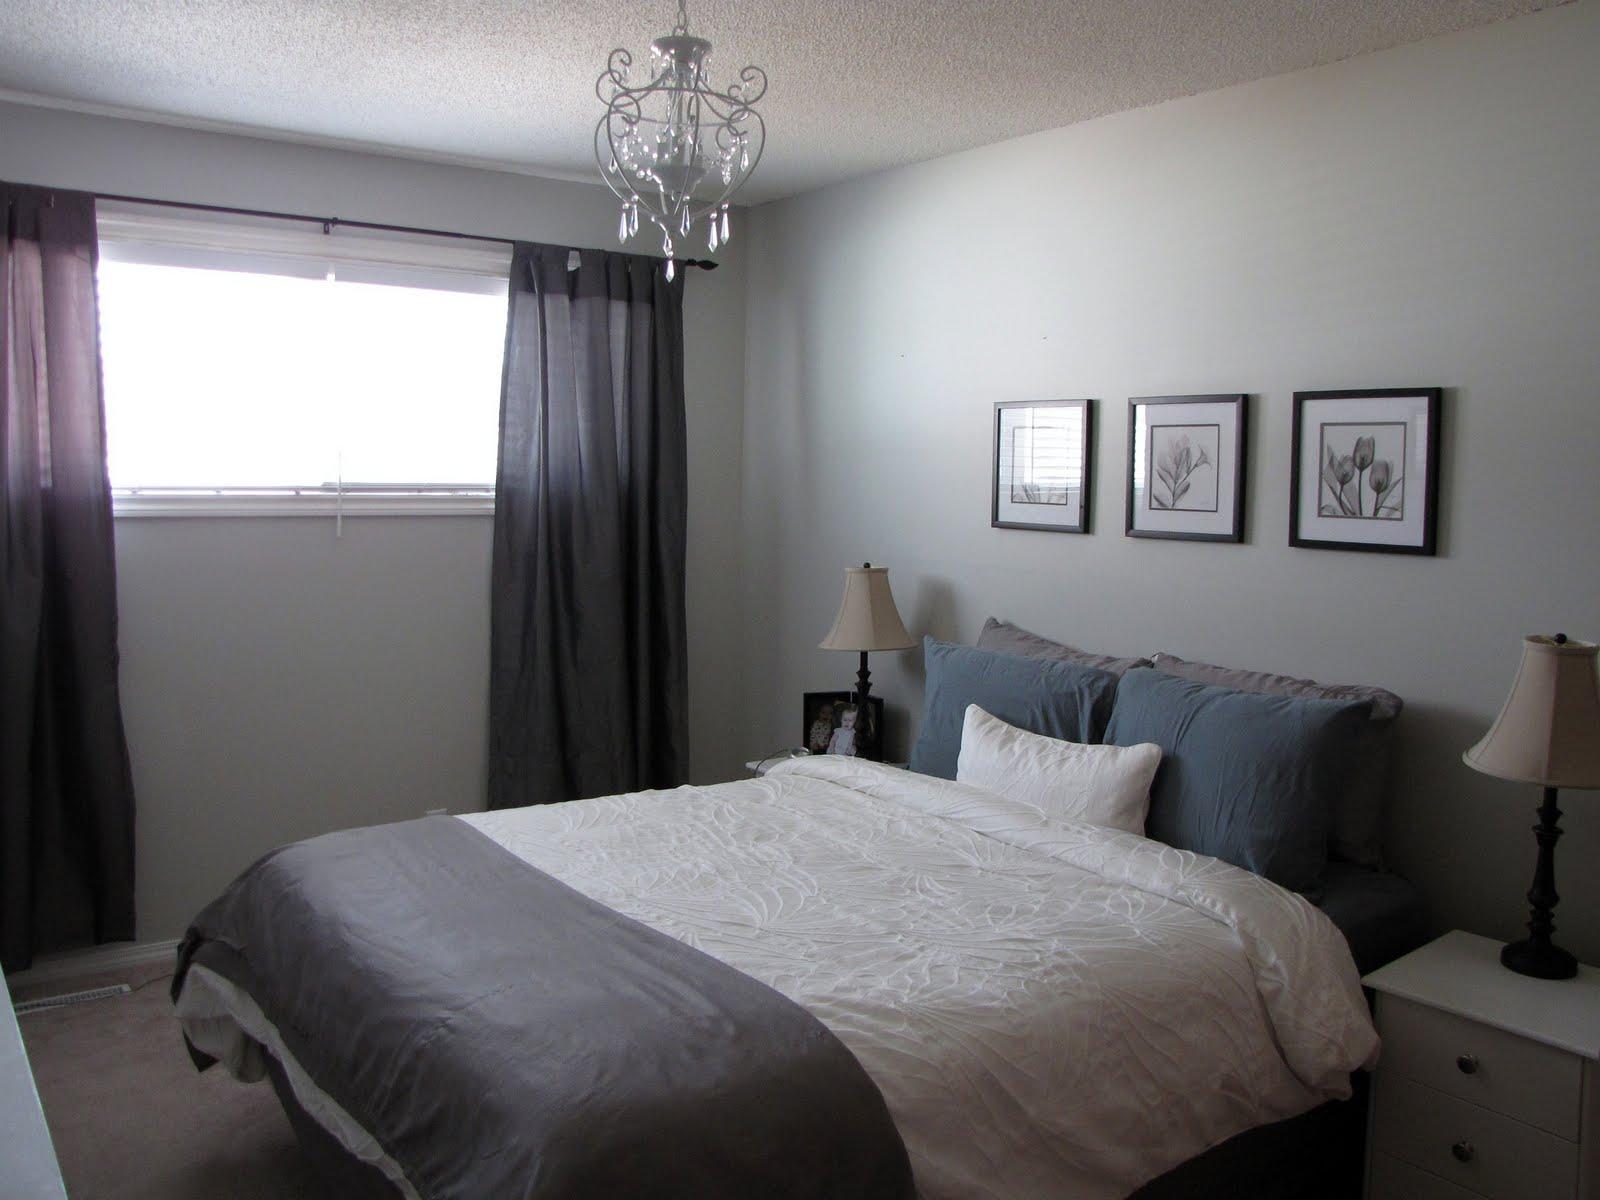 Best Benjamin Moore Paint Homemaking Pilgrim Master Bedroom Makeover Finished